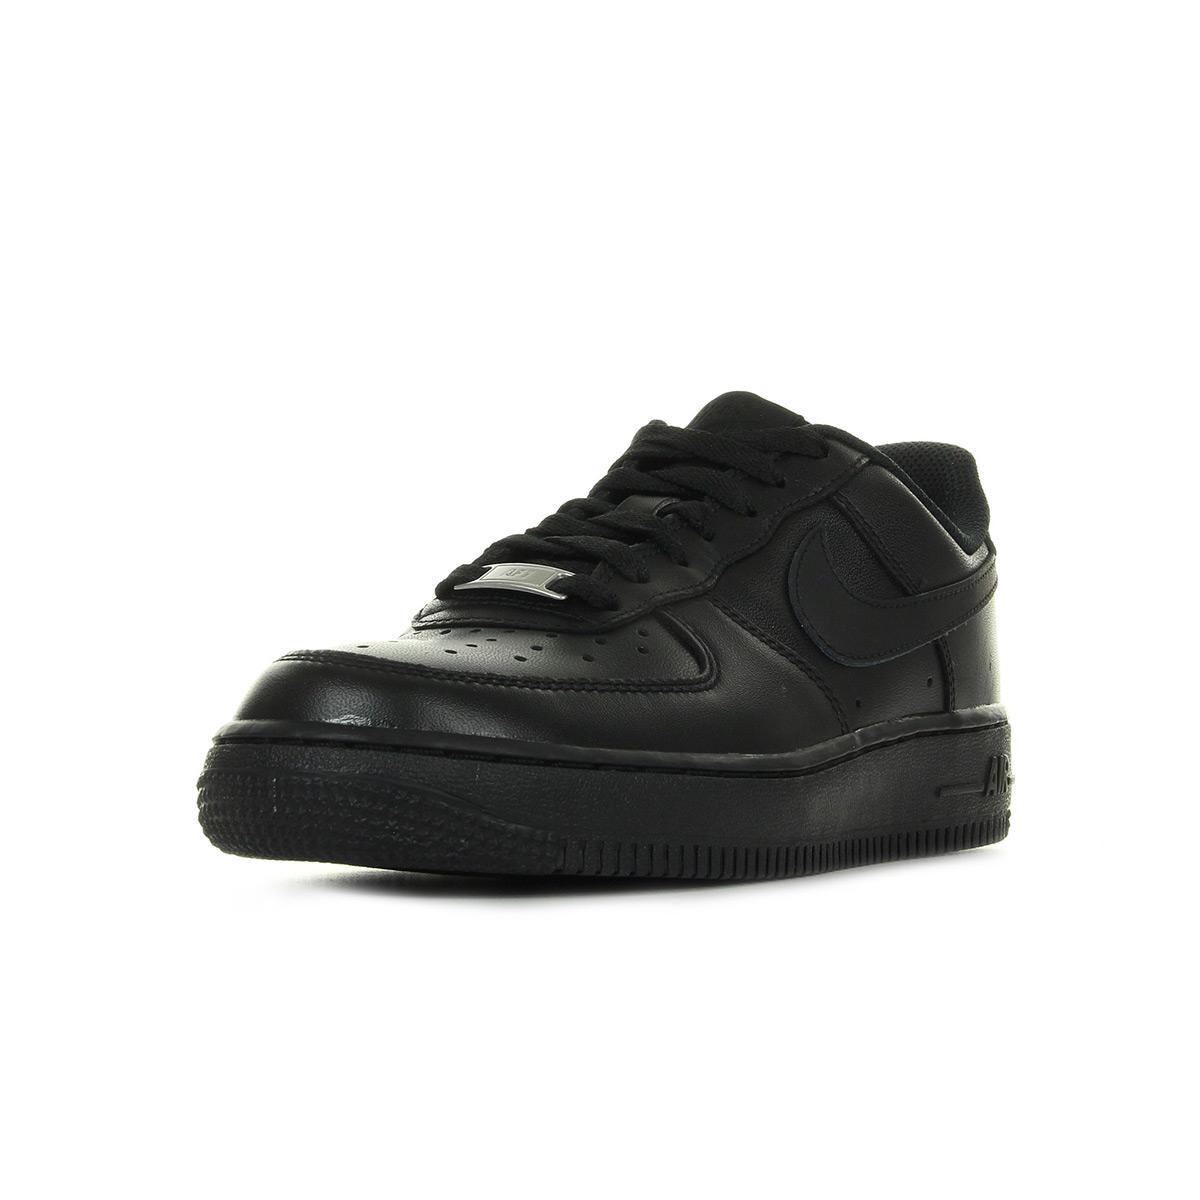 Chaussures Baskets Nike femme Air Force 1 07 taille Noir Noire Cuir Lacets